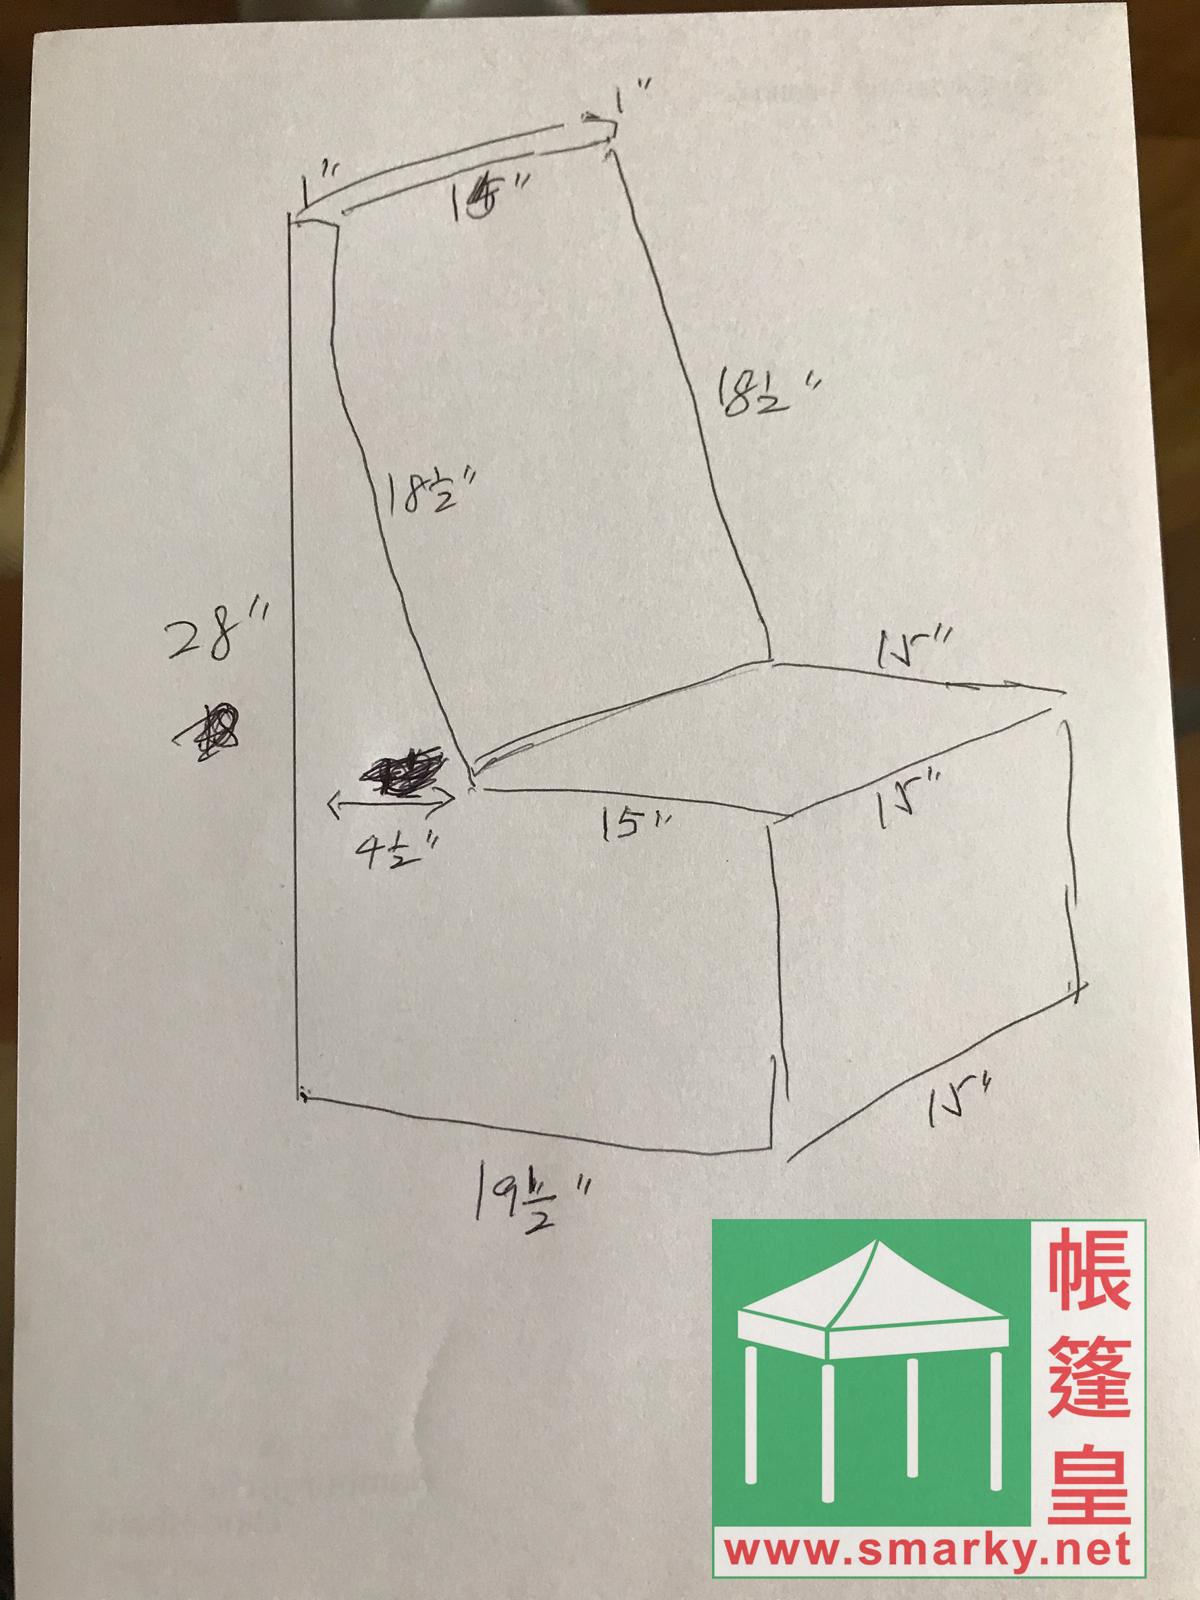 WhatsApp Image 2019-08-17 at 10.56.46_副本